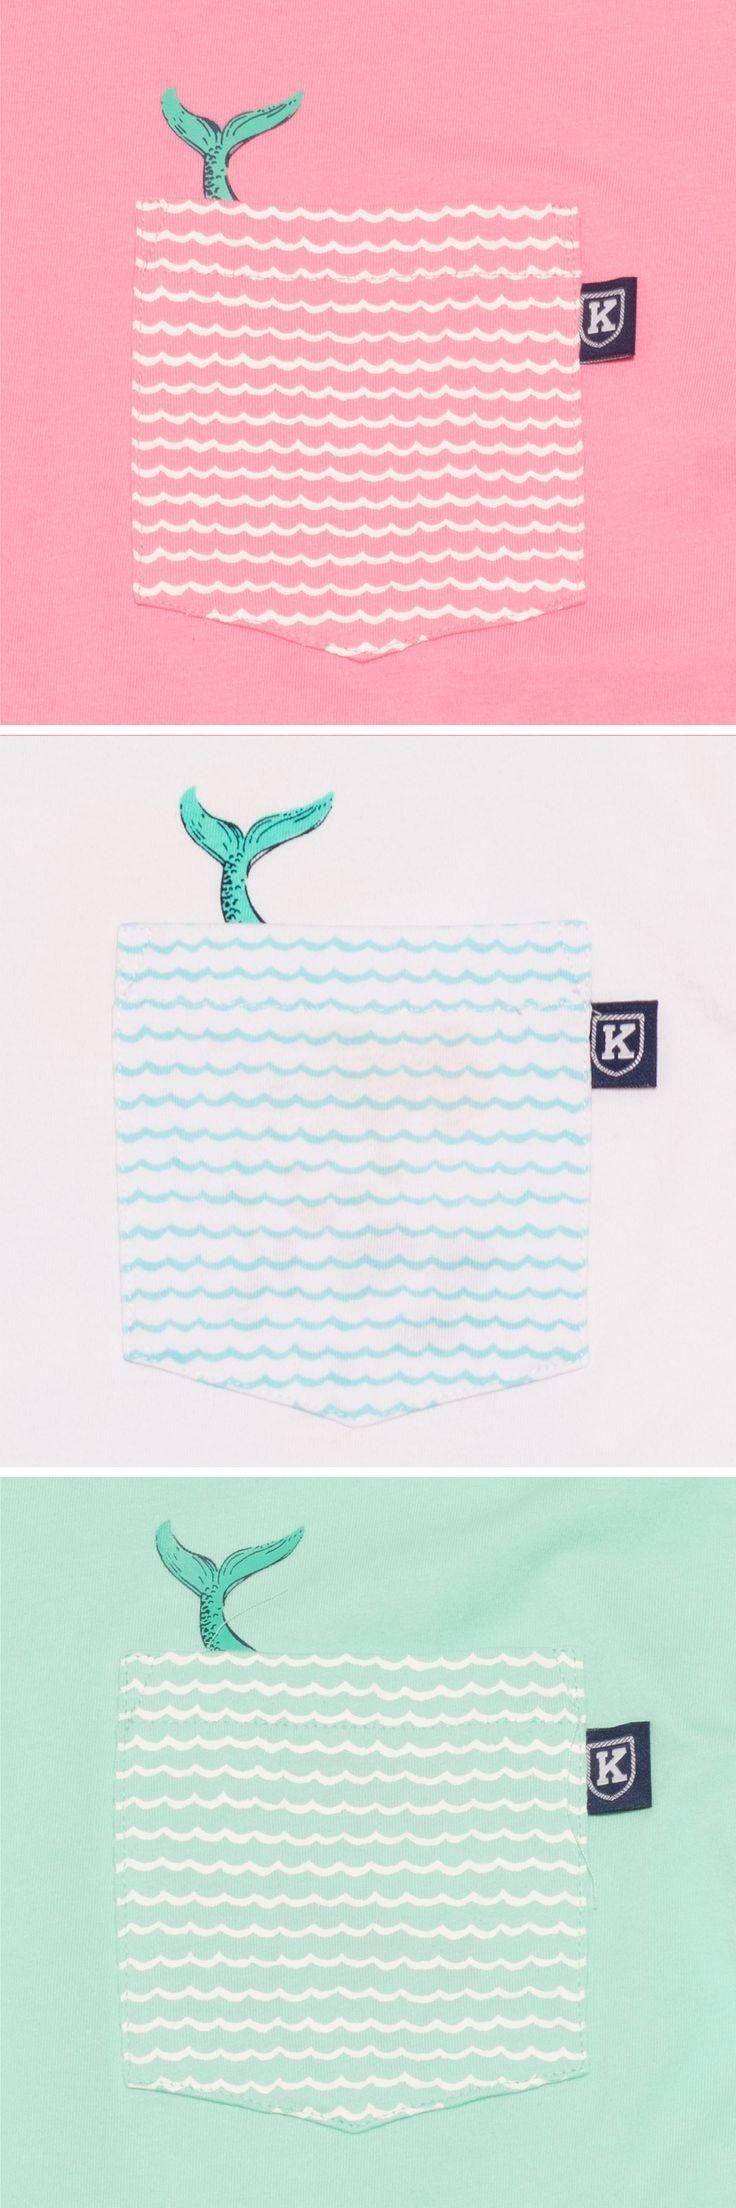 The Mermaid Hidden Pocket Tee™ by Krass & Co.